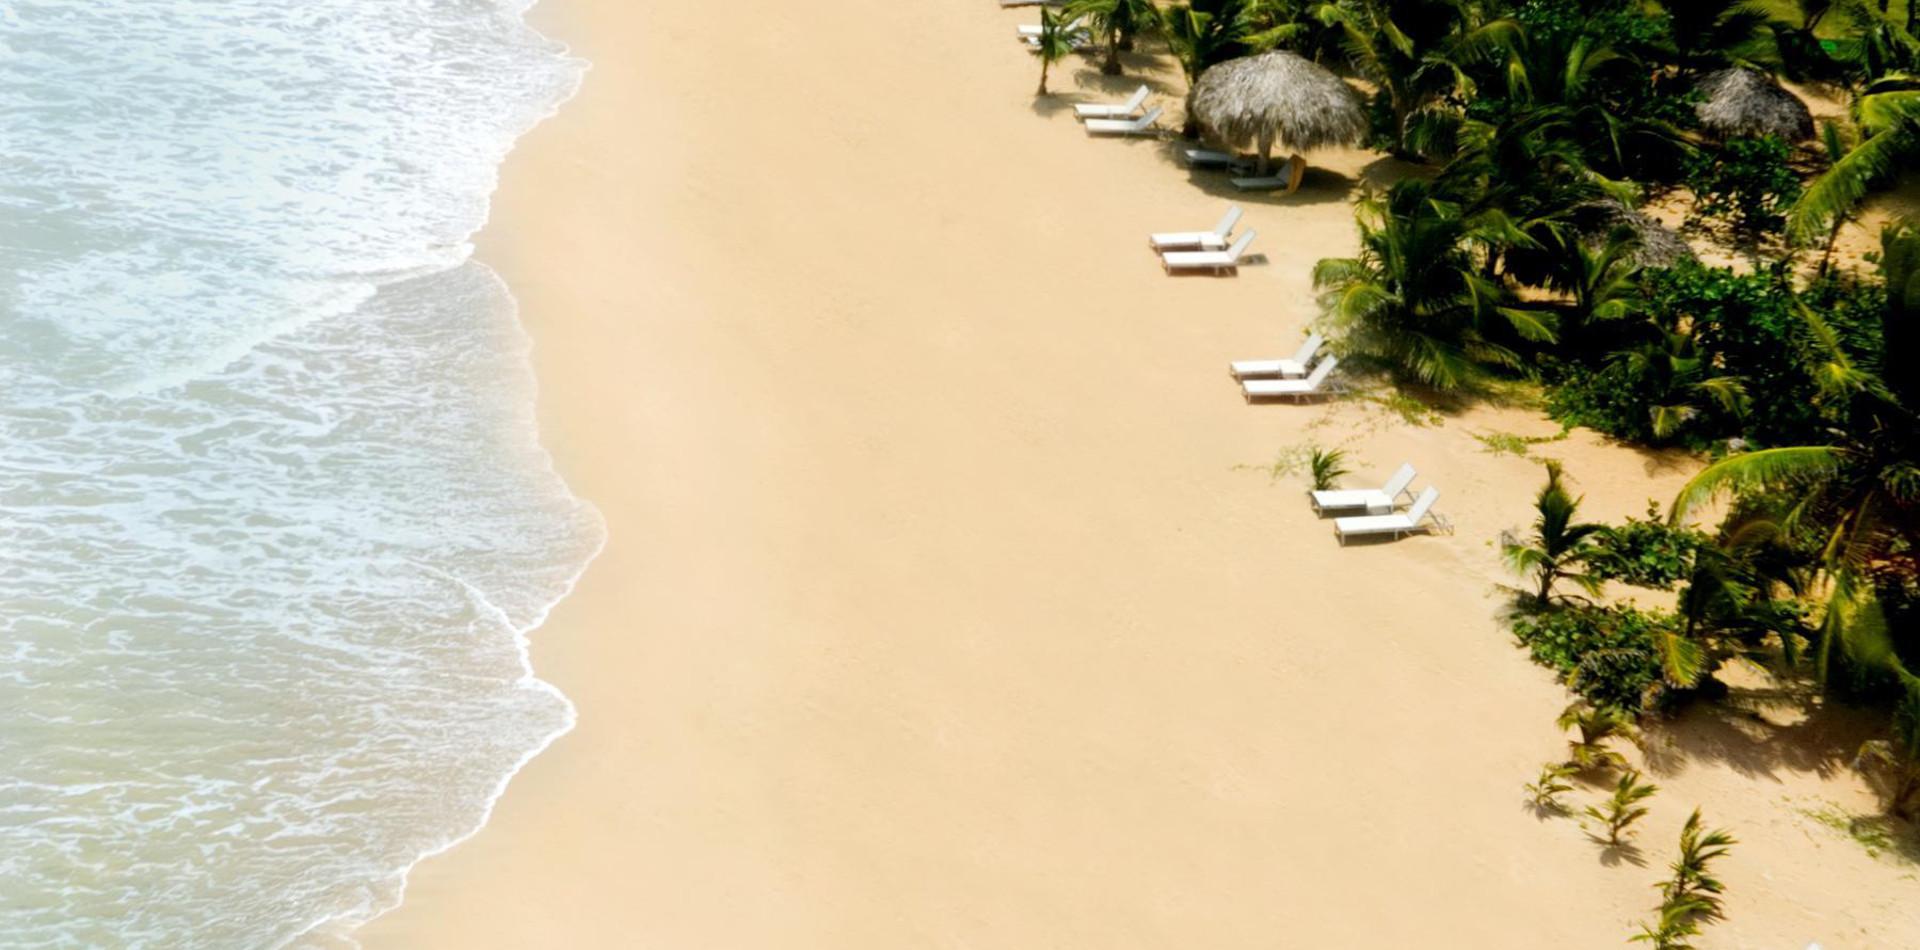 Boutique Hotel Sivory Punta Cana Dominikanische Republik, Luxusurlaub Dominikanische Republik